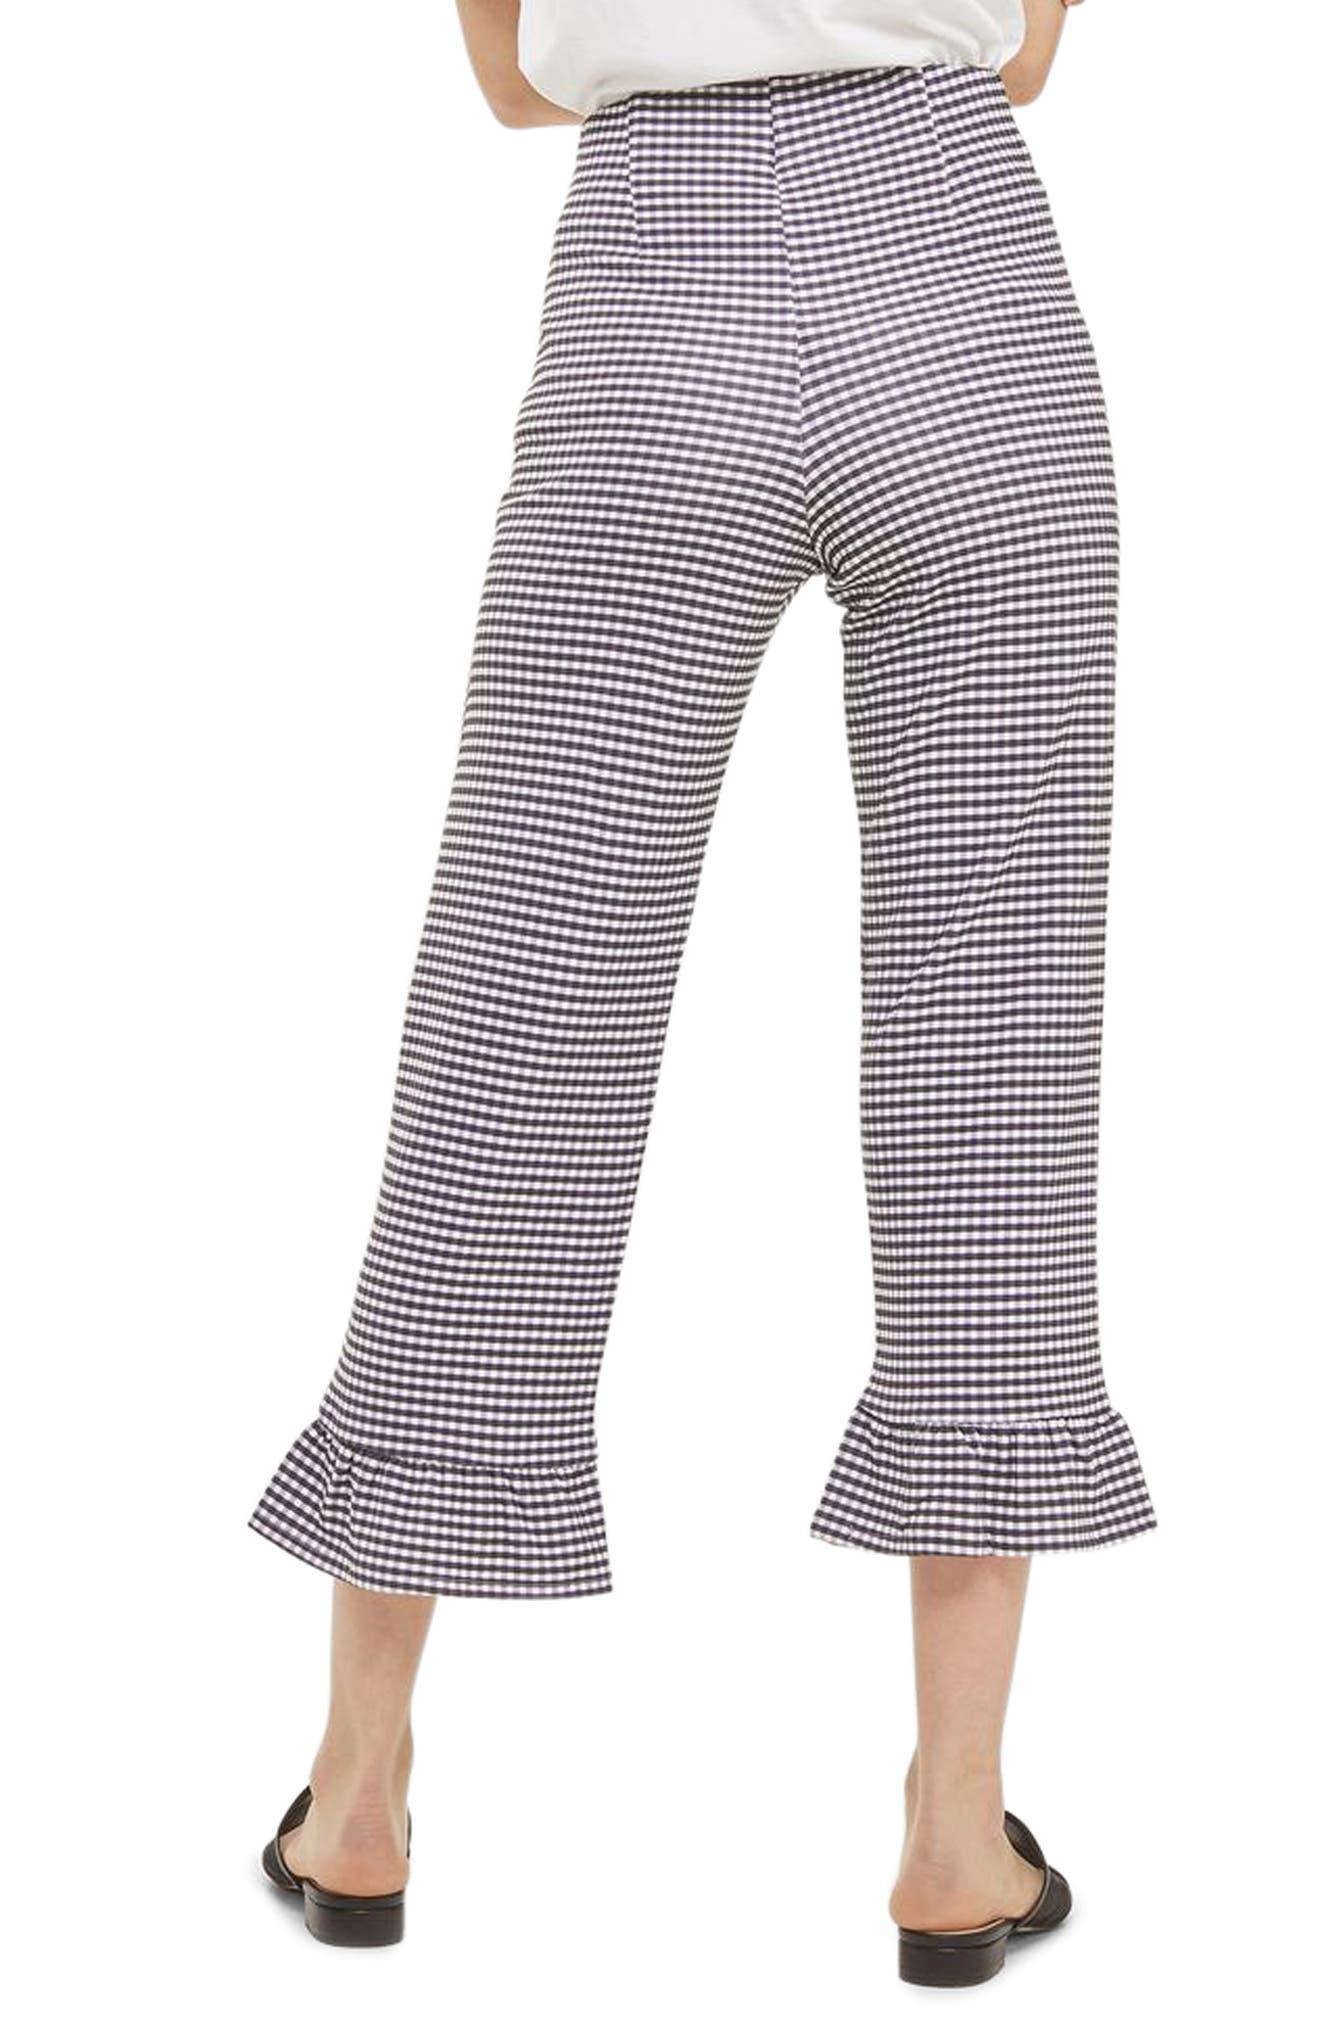 Alternate Image 3  - Topshop Gingham Ruffle Capri Trousers